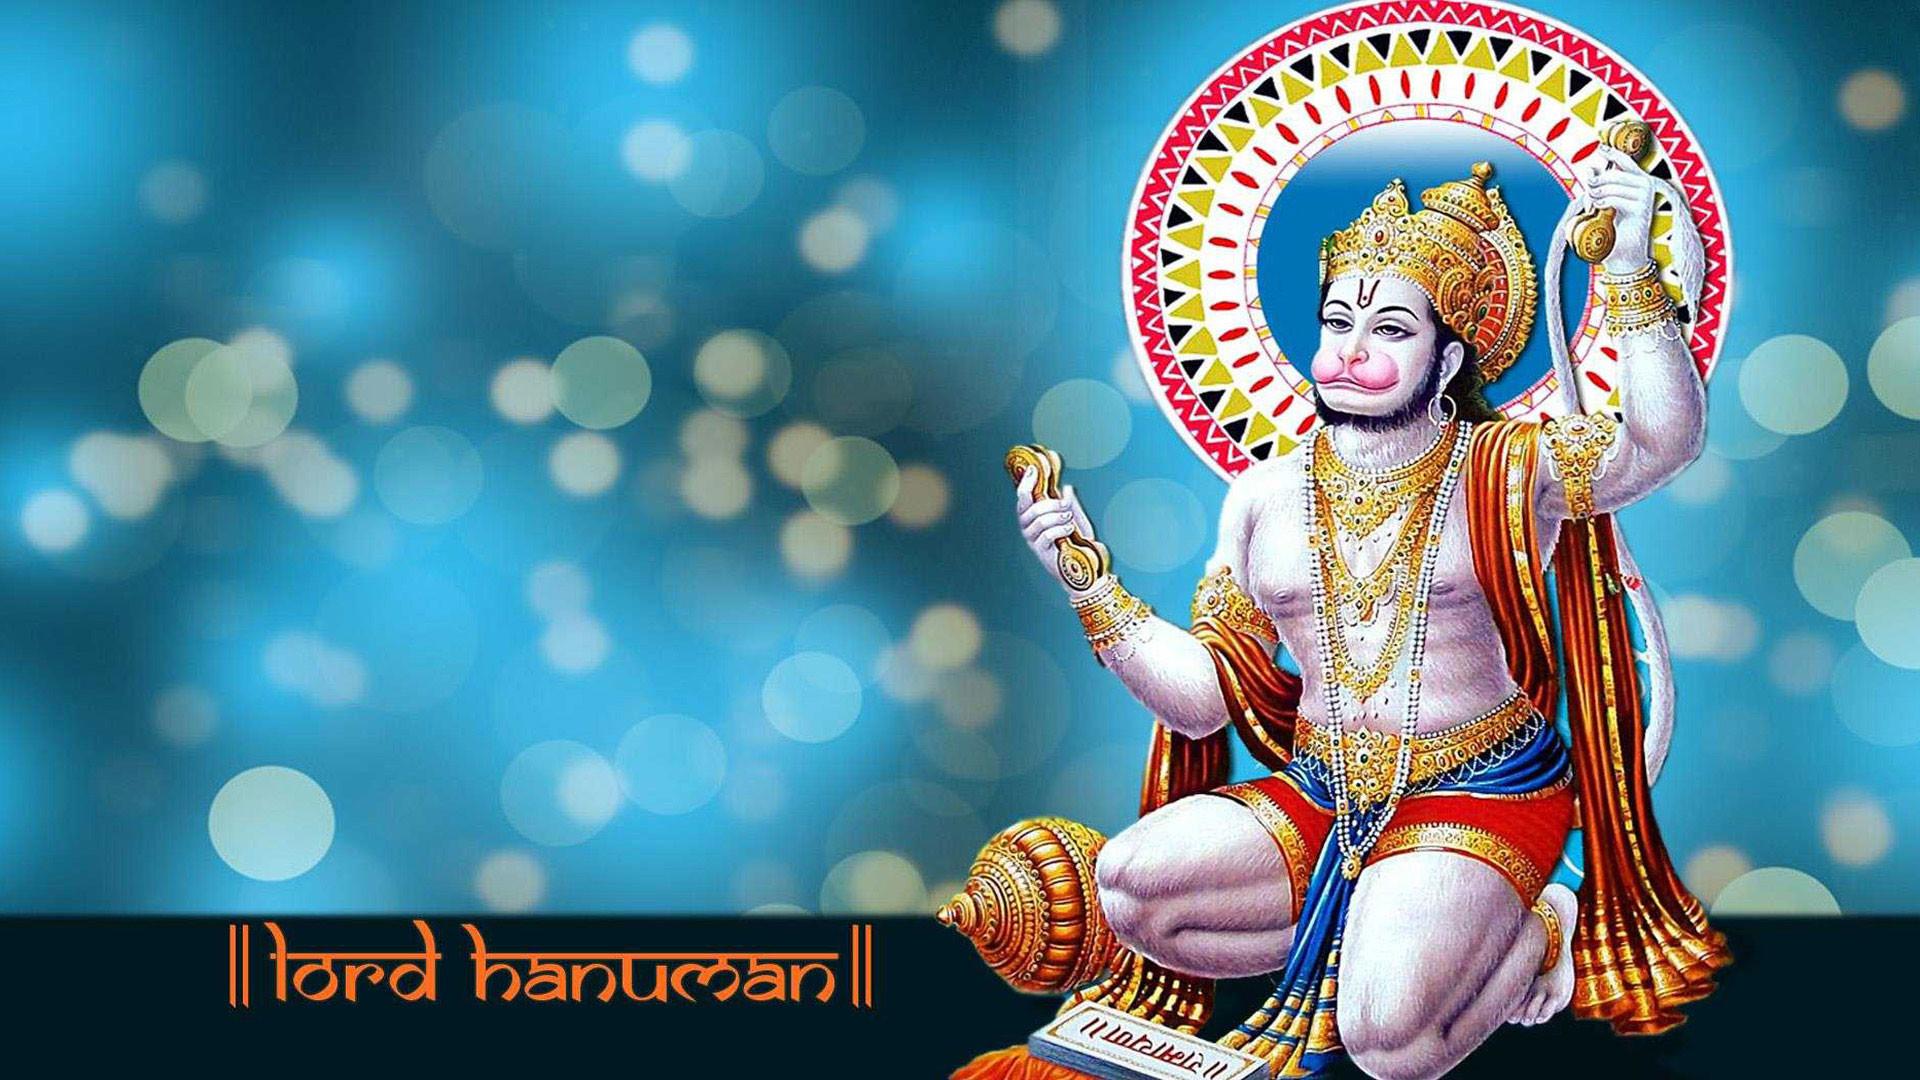 hd pics photos gods hindu lord hanuman new desktop background wallpaper